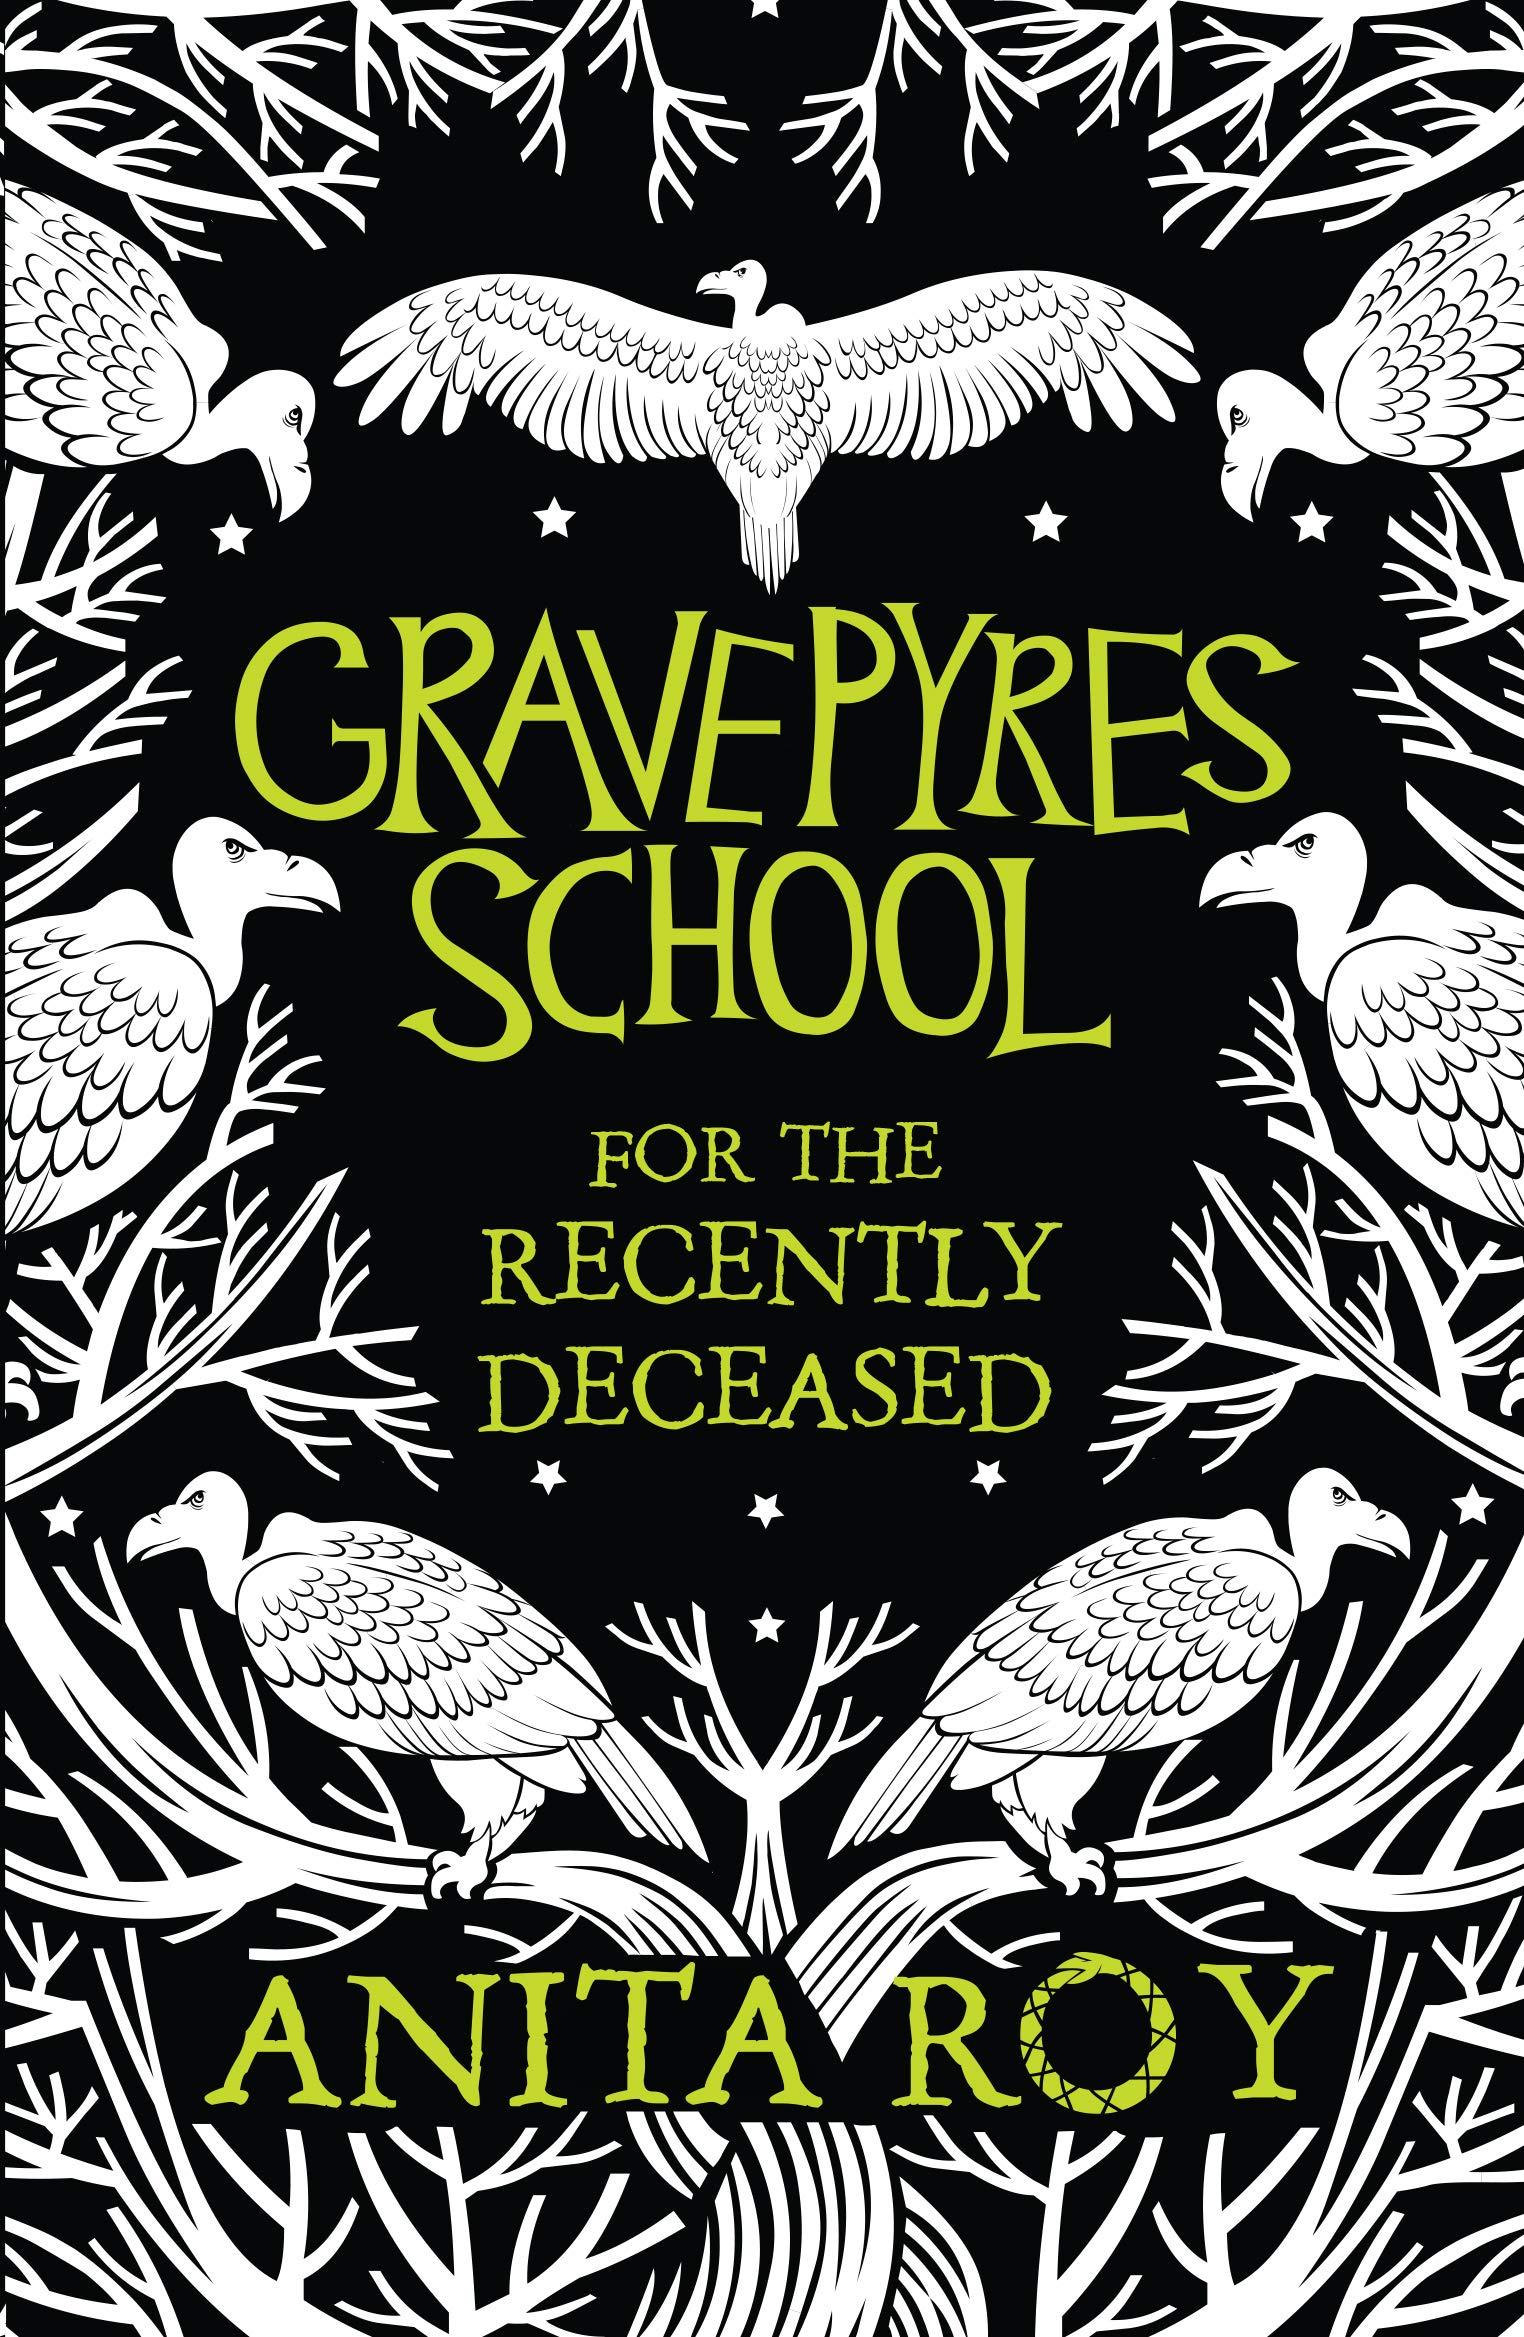 Gravepyres School for the Recently Deceased /